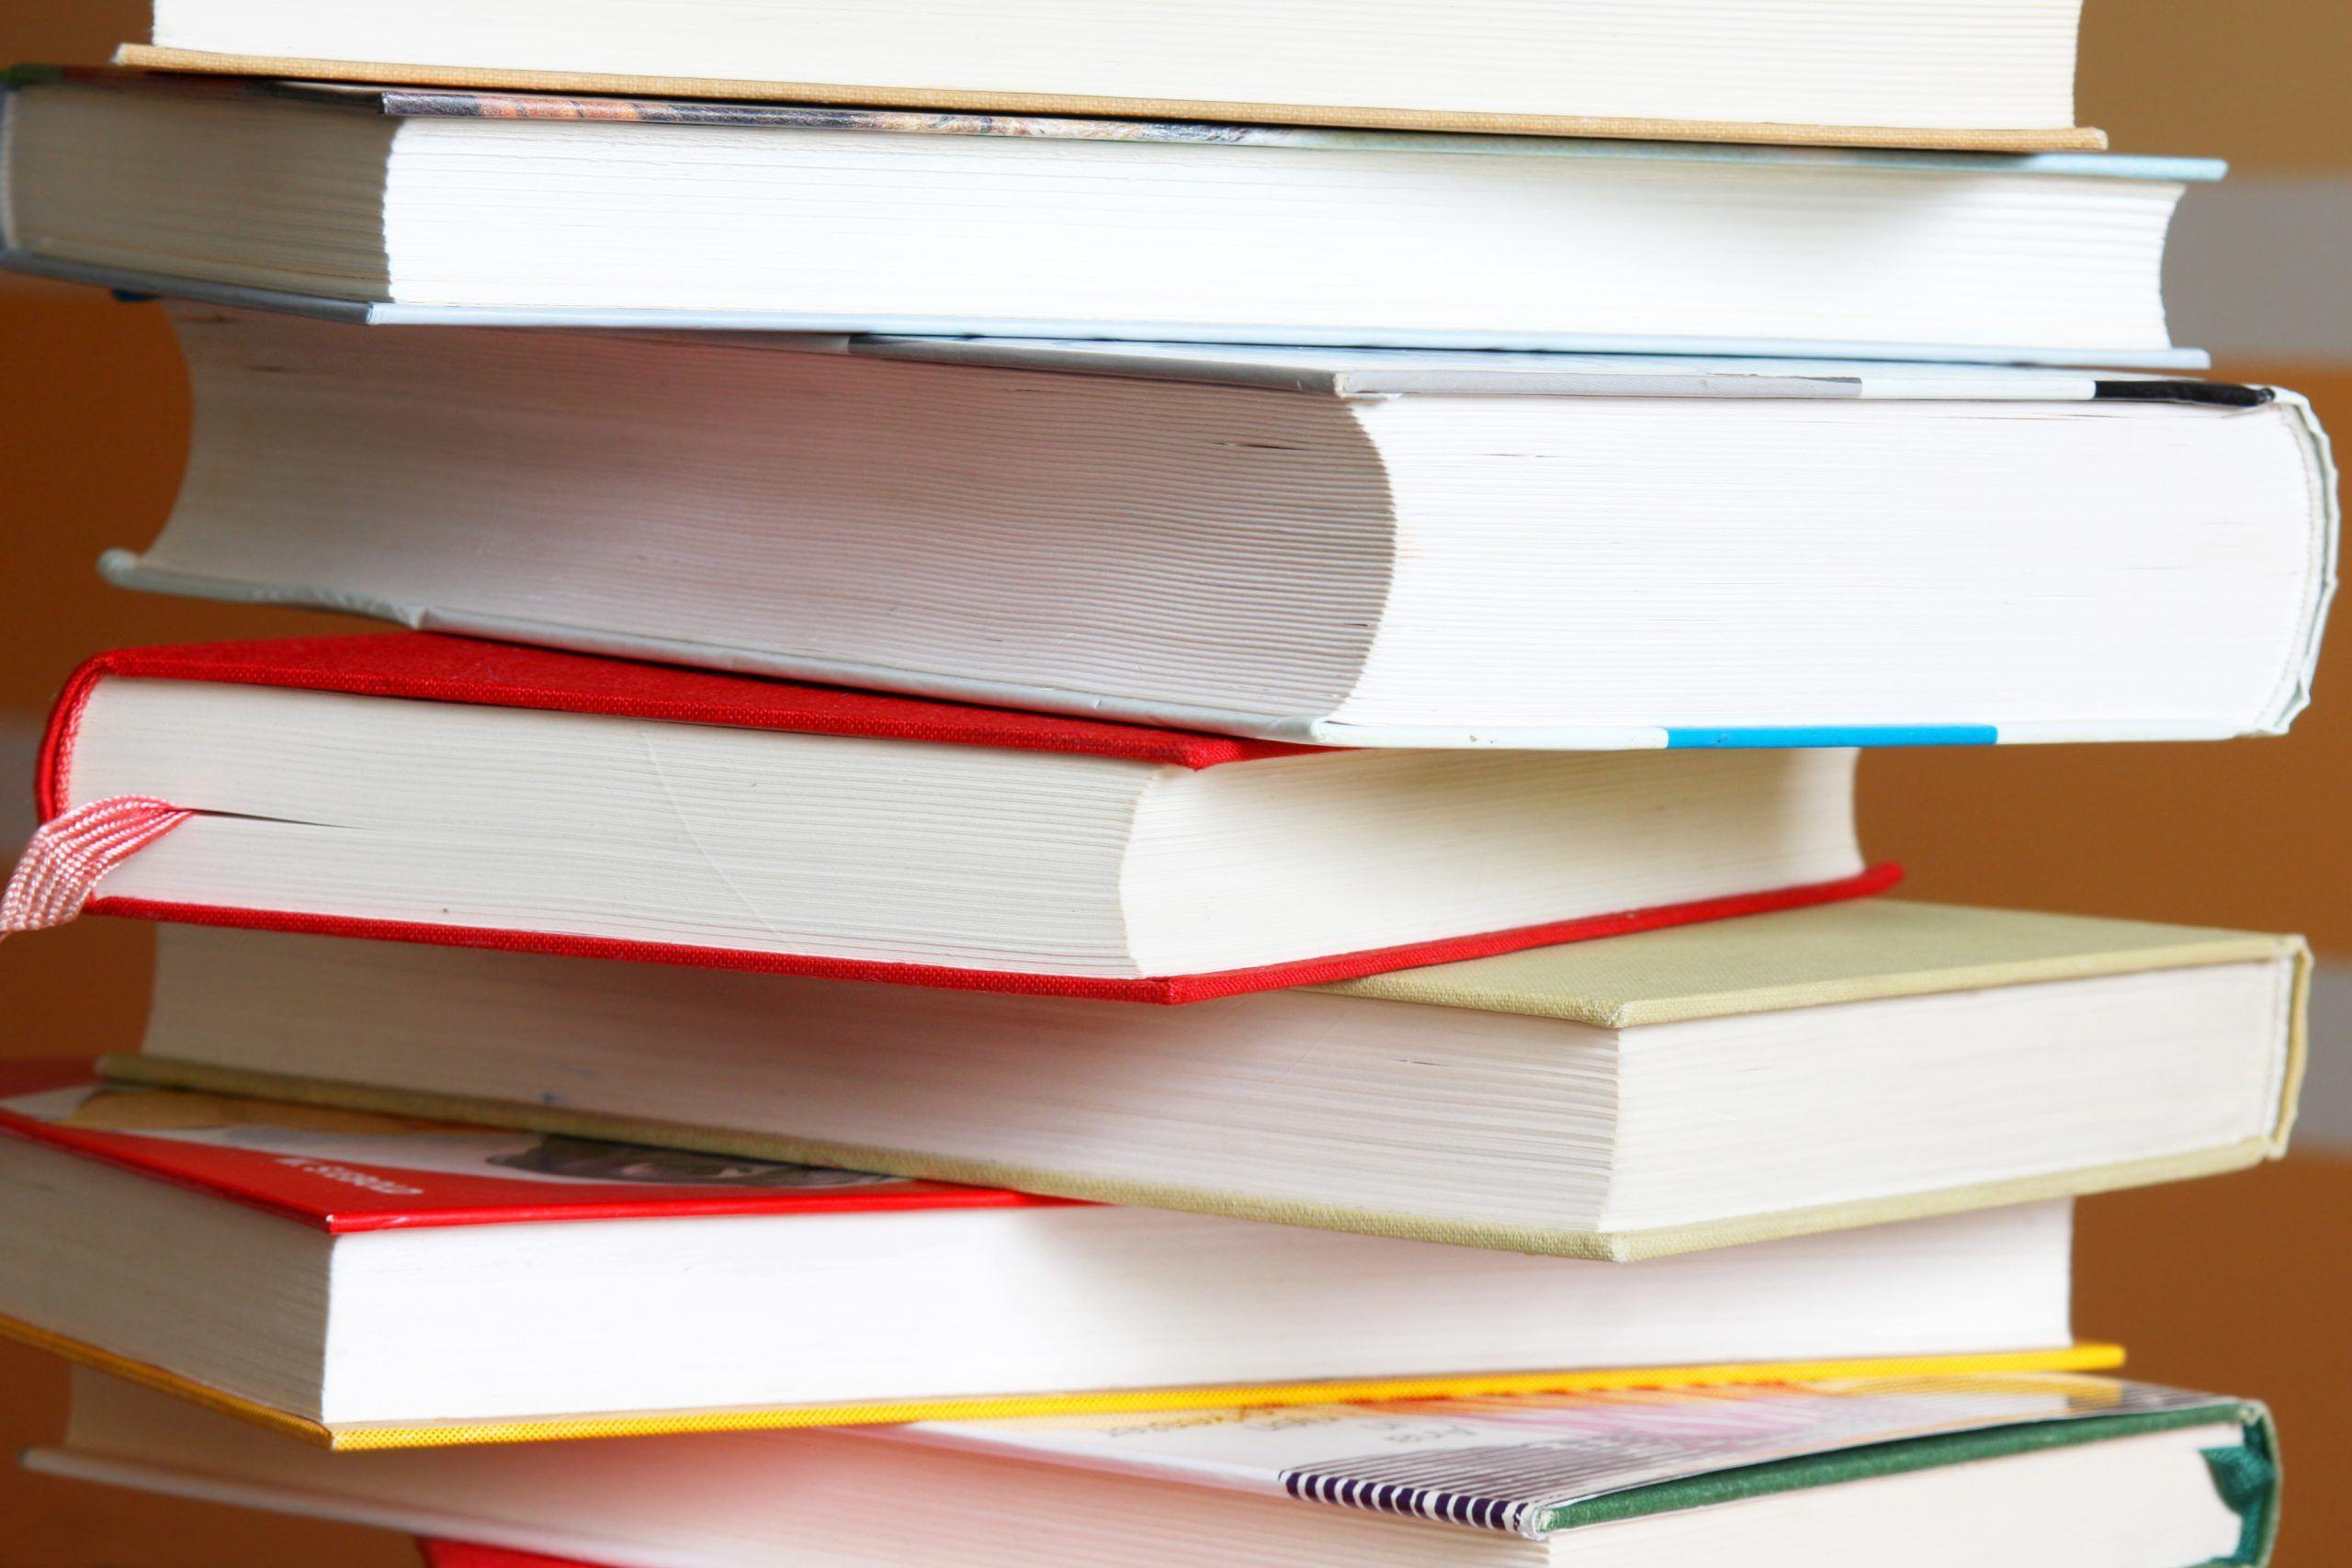 Classifica dei libri più venduti ad aprile 2014: trionfa Storia di una ladra di libri